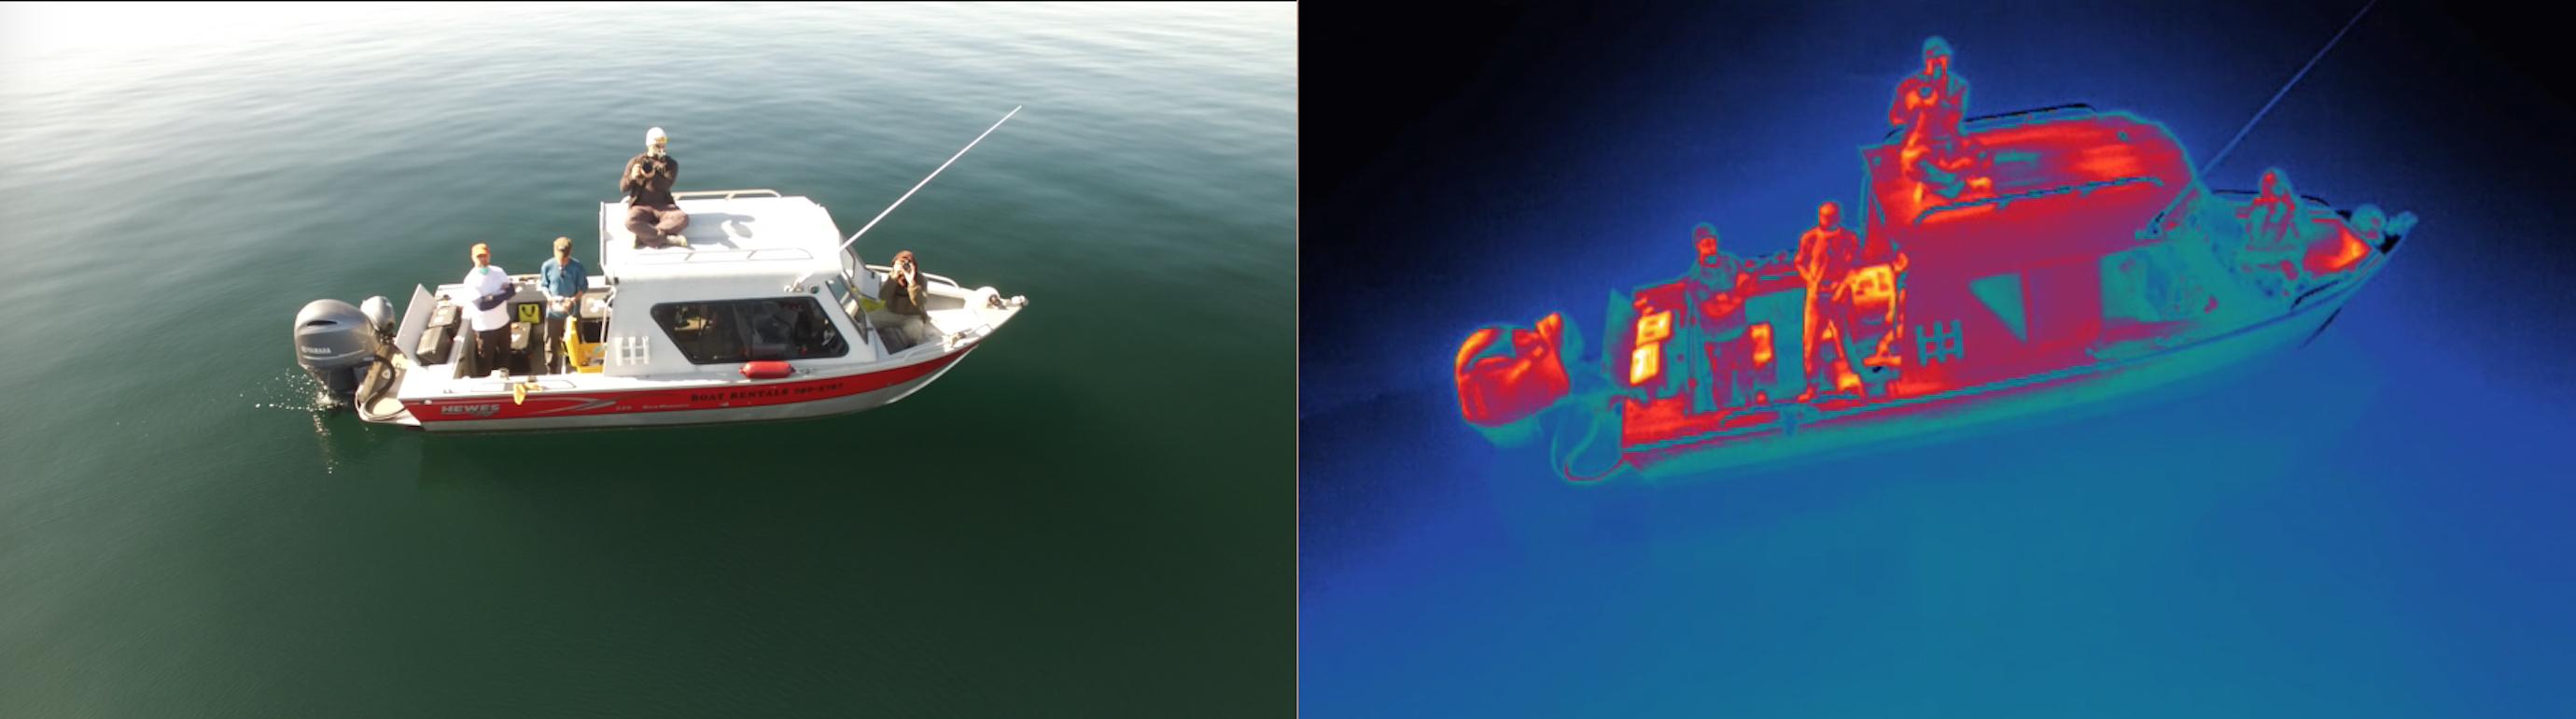 Boat FLIR comparison